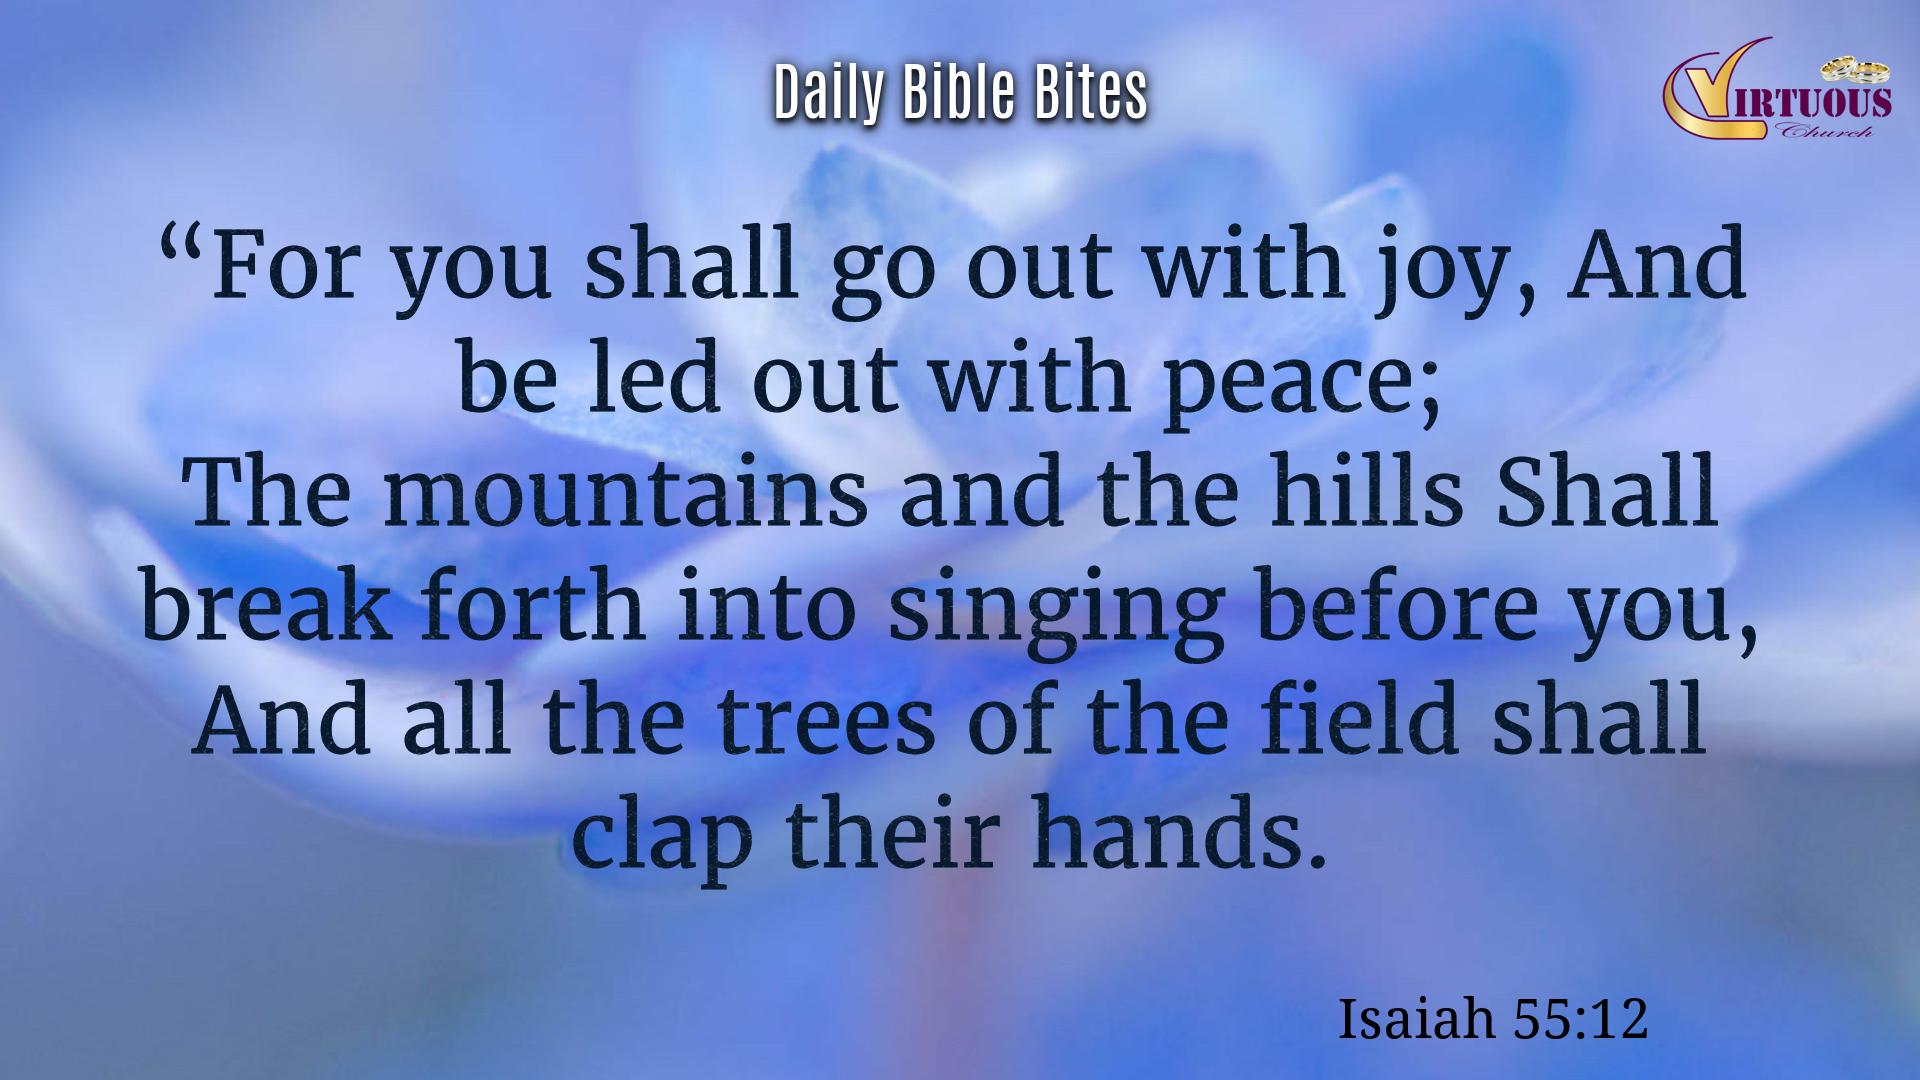 Daily Bible Bites 5